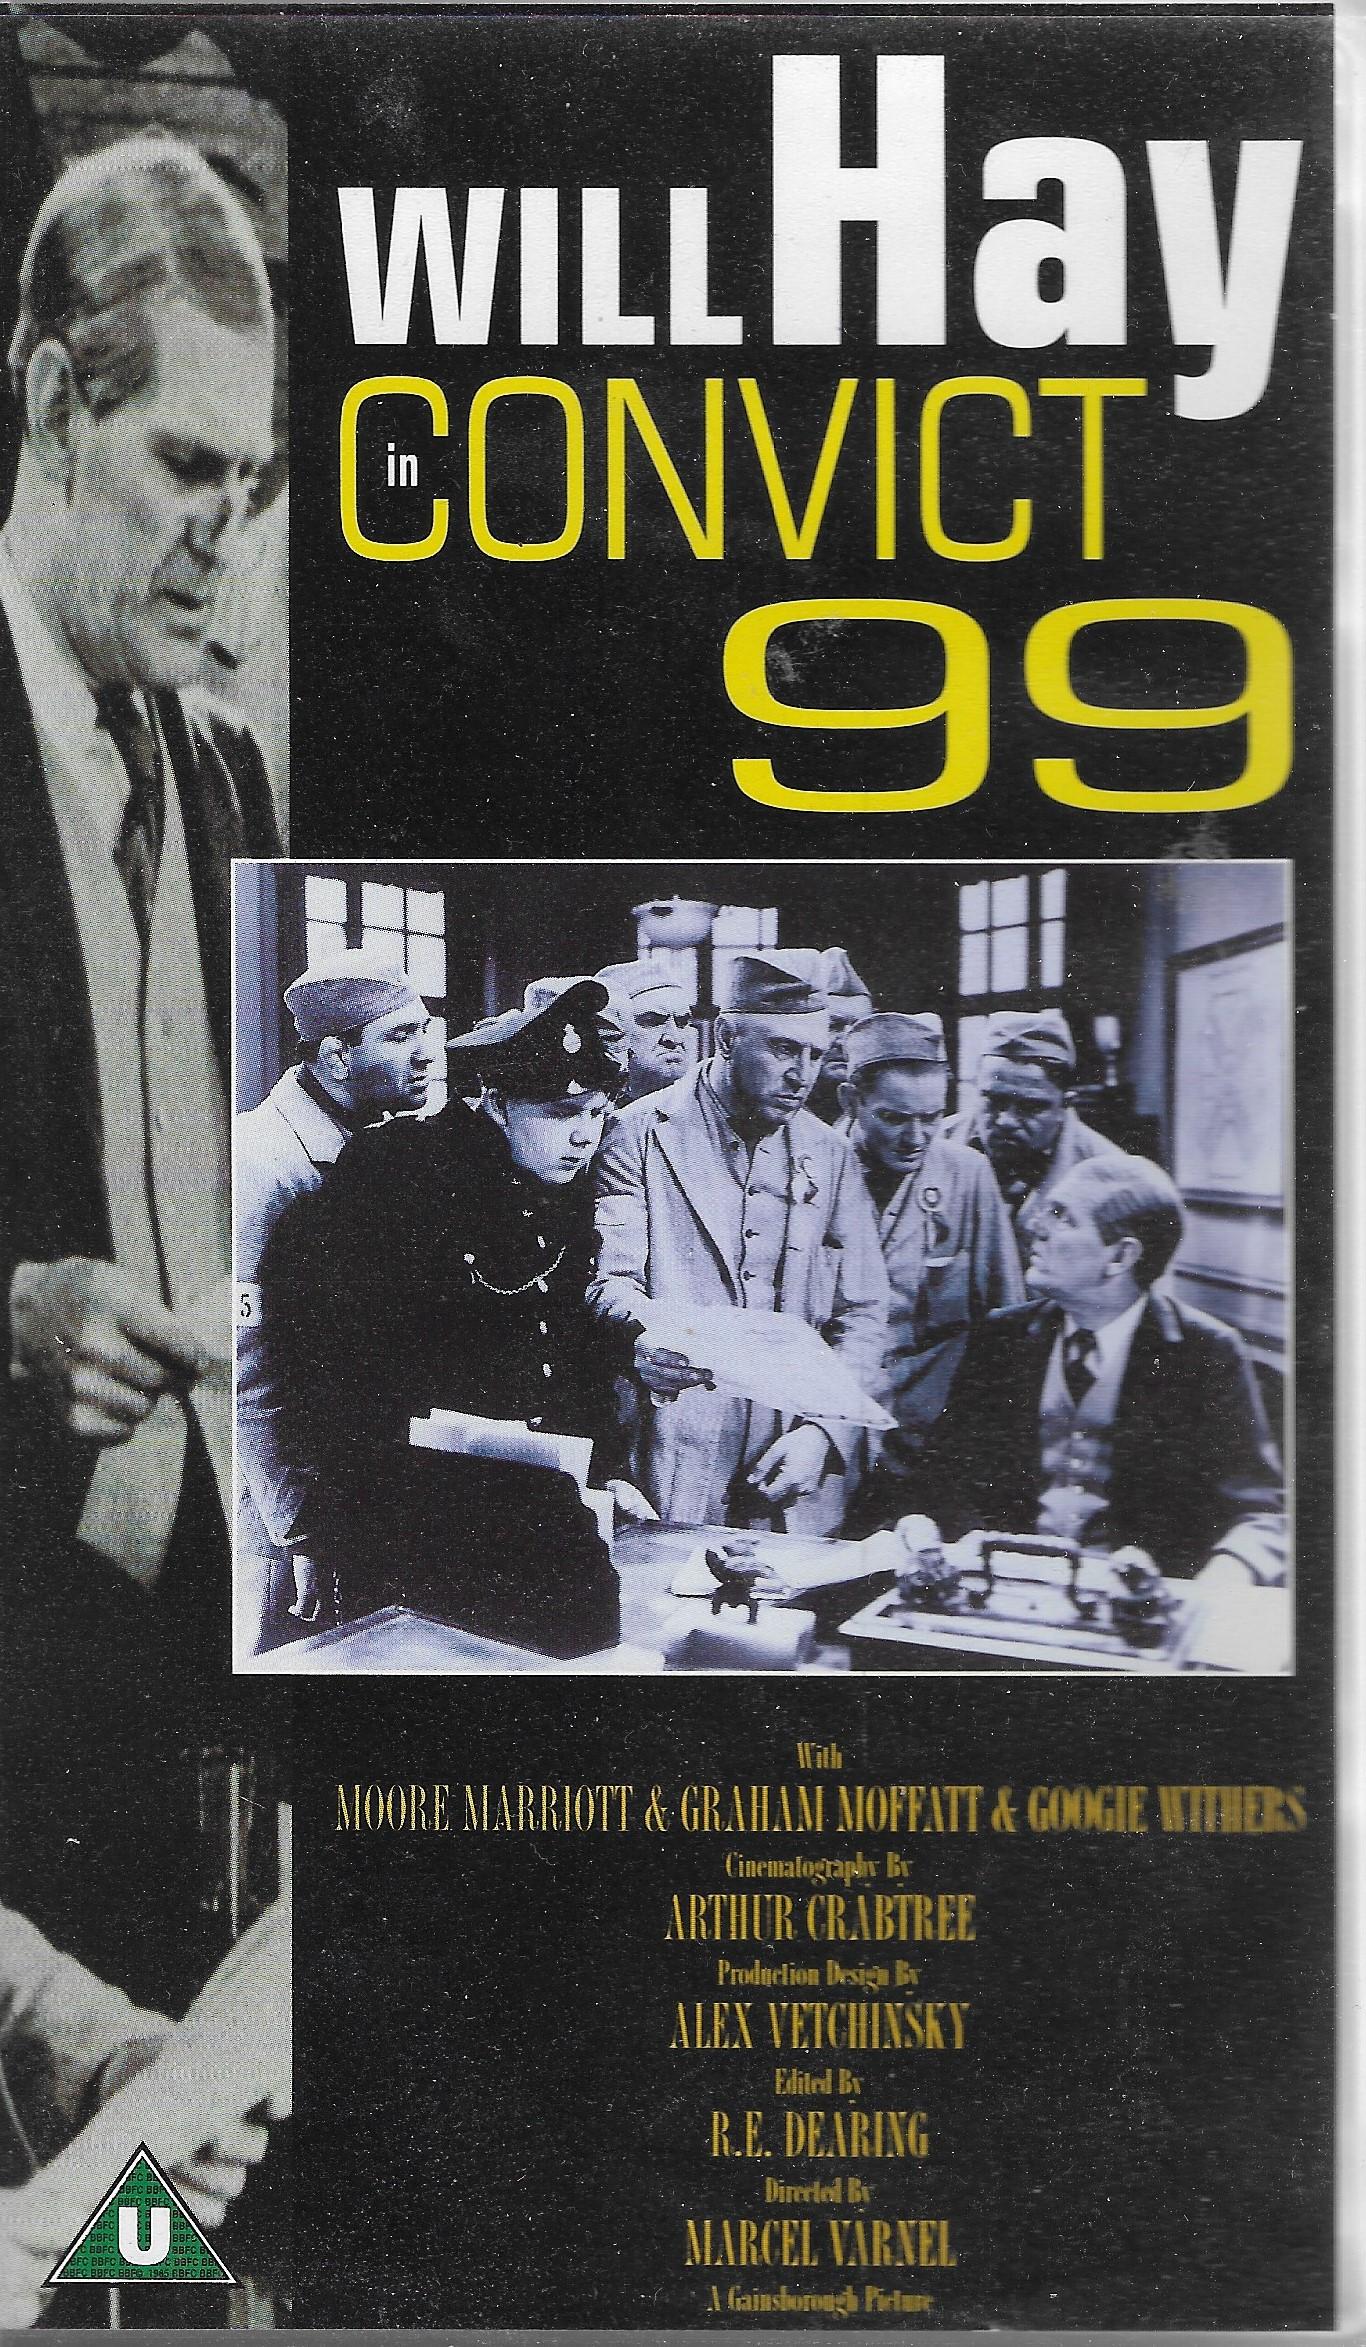 Convict 99 (1938)